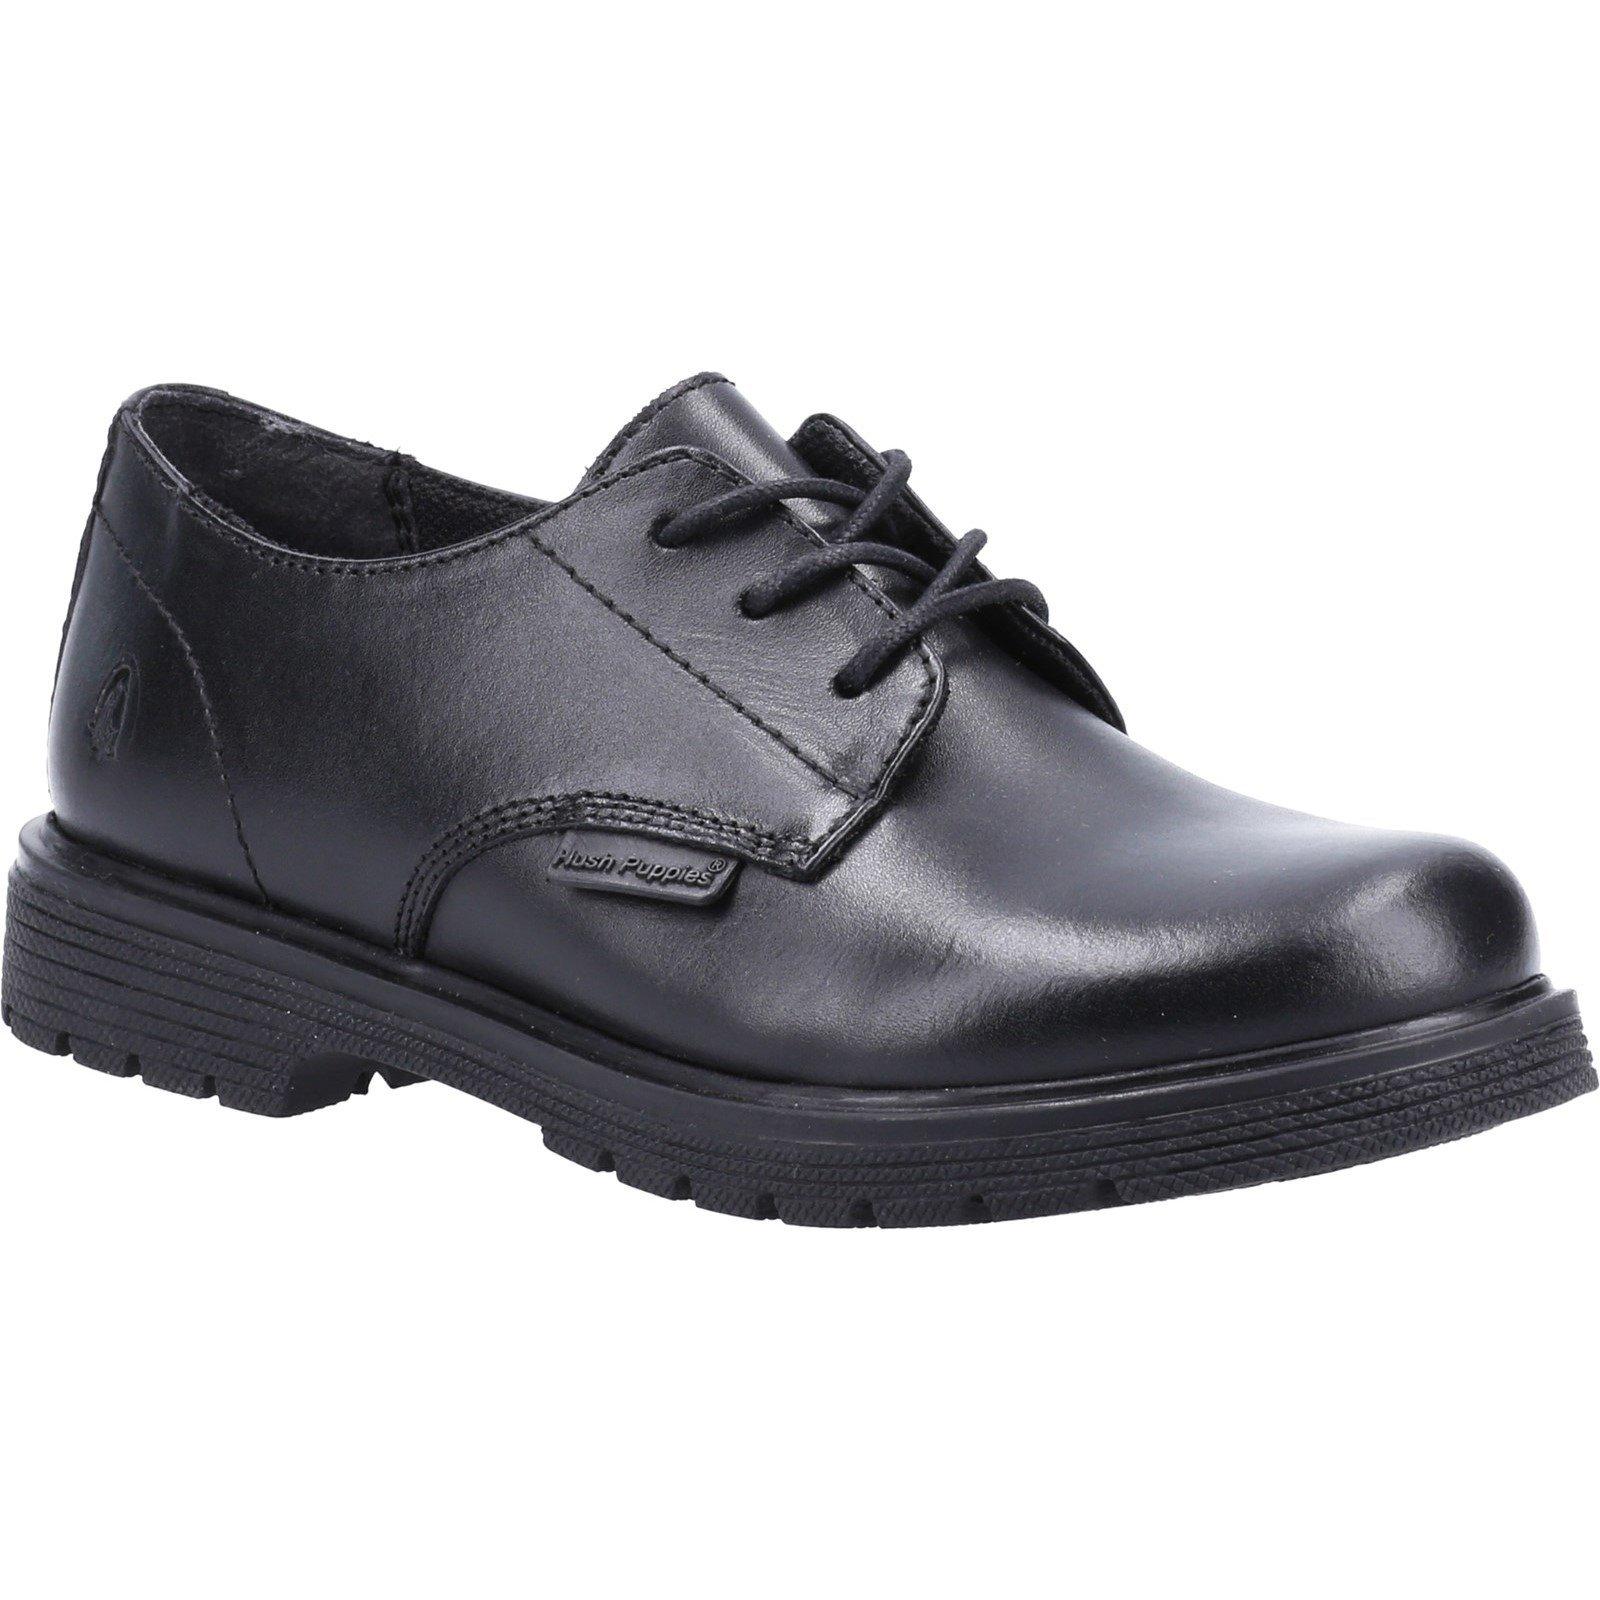 Hush Puppies Kid's Remi Senior School Derby Shoe Black 32613 - Black 6